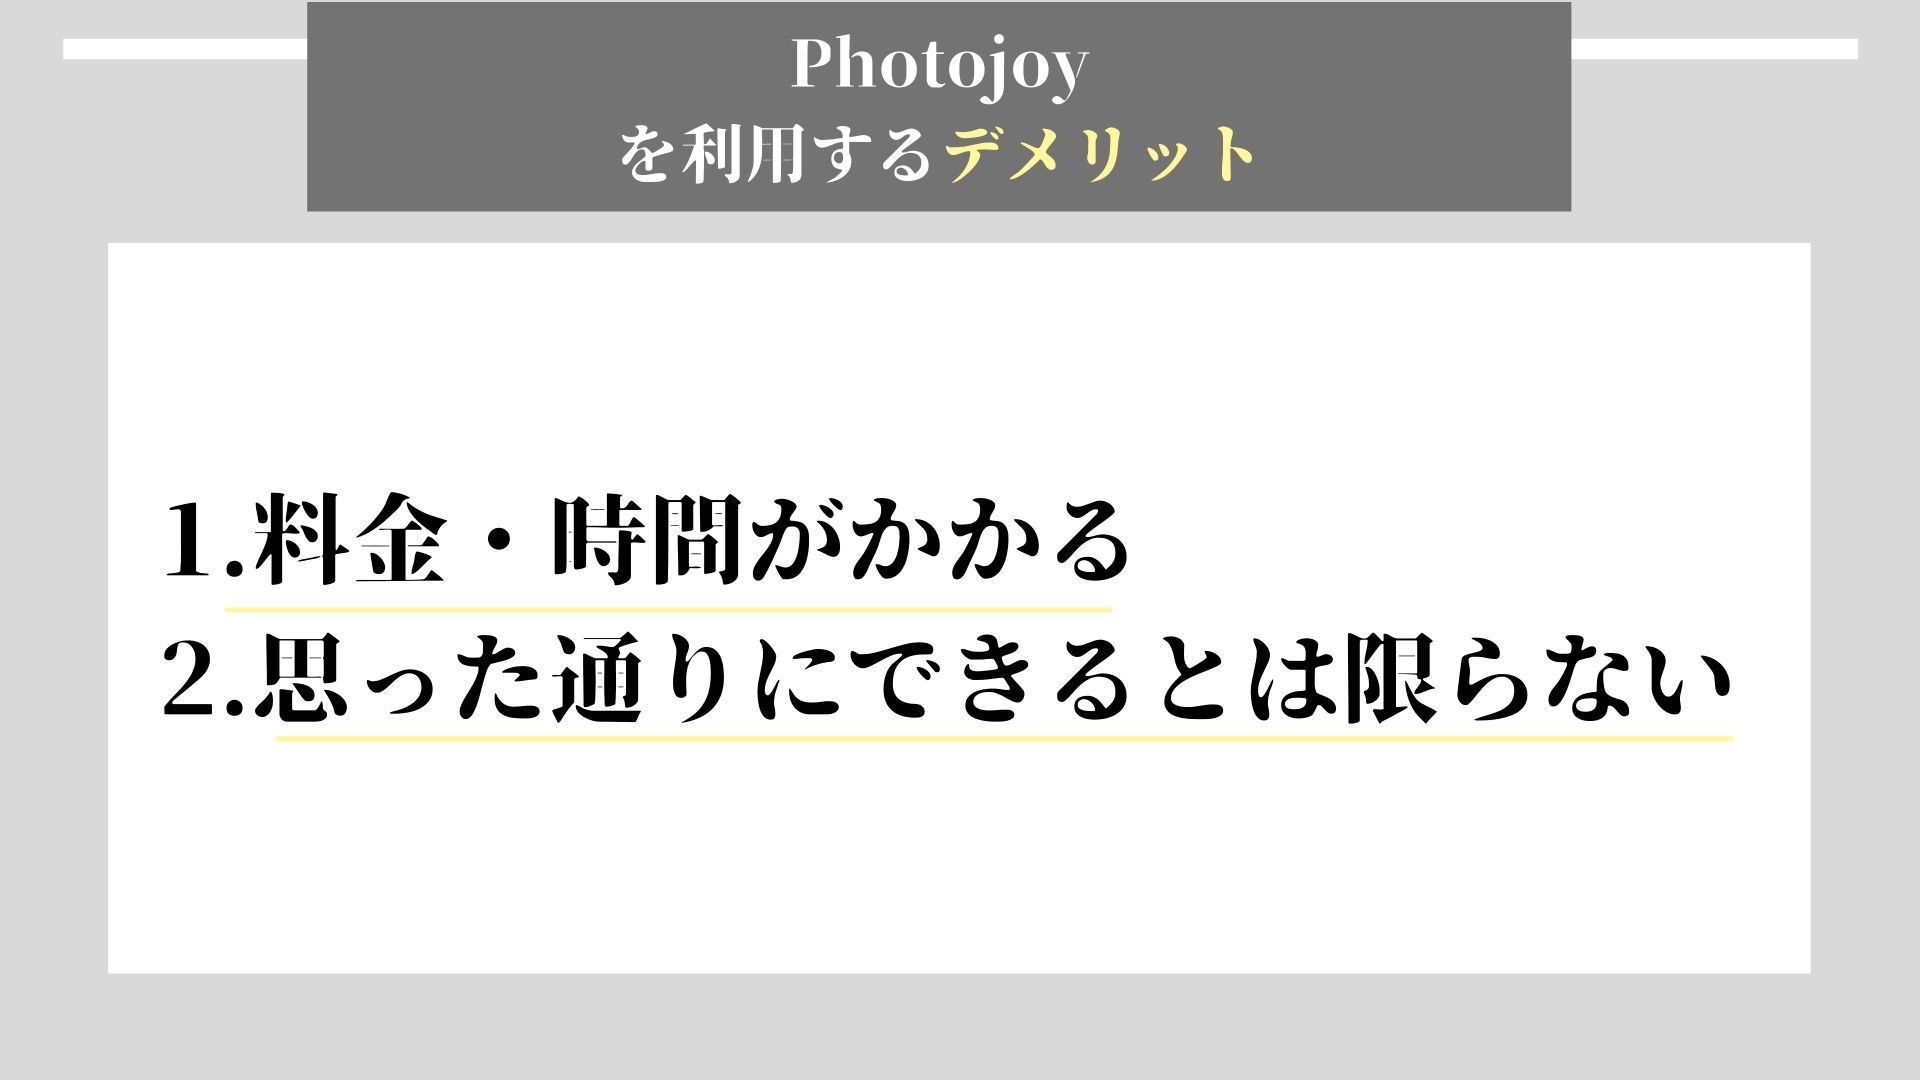 Photojoy デメリット